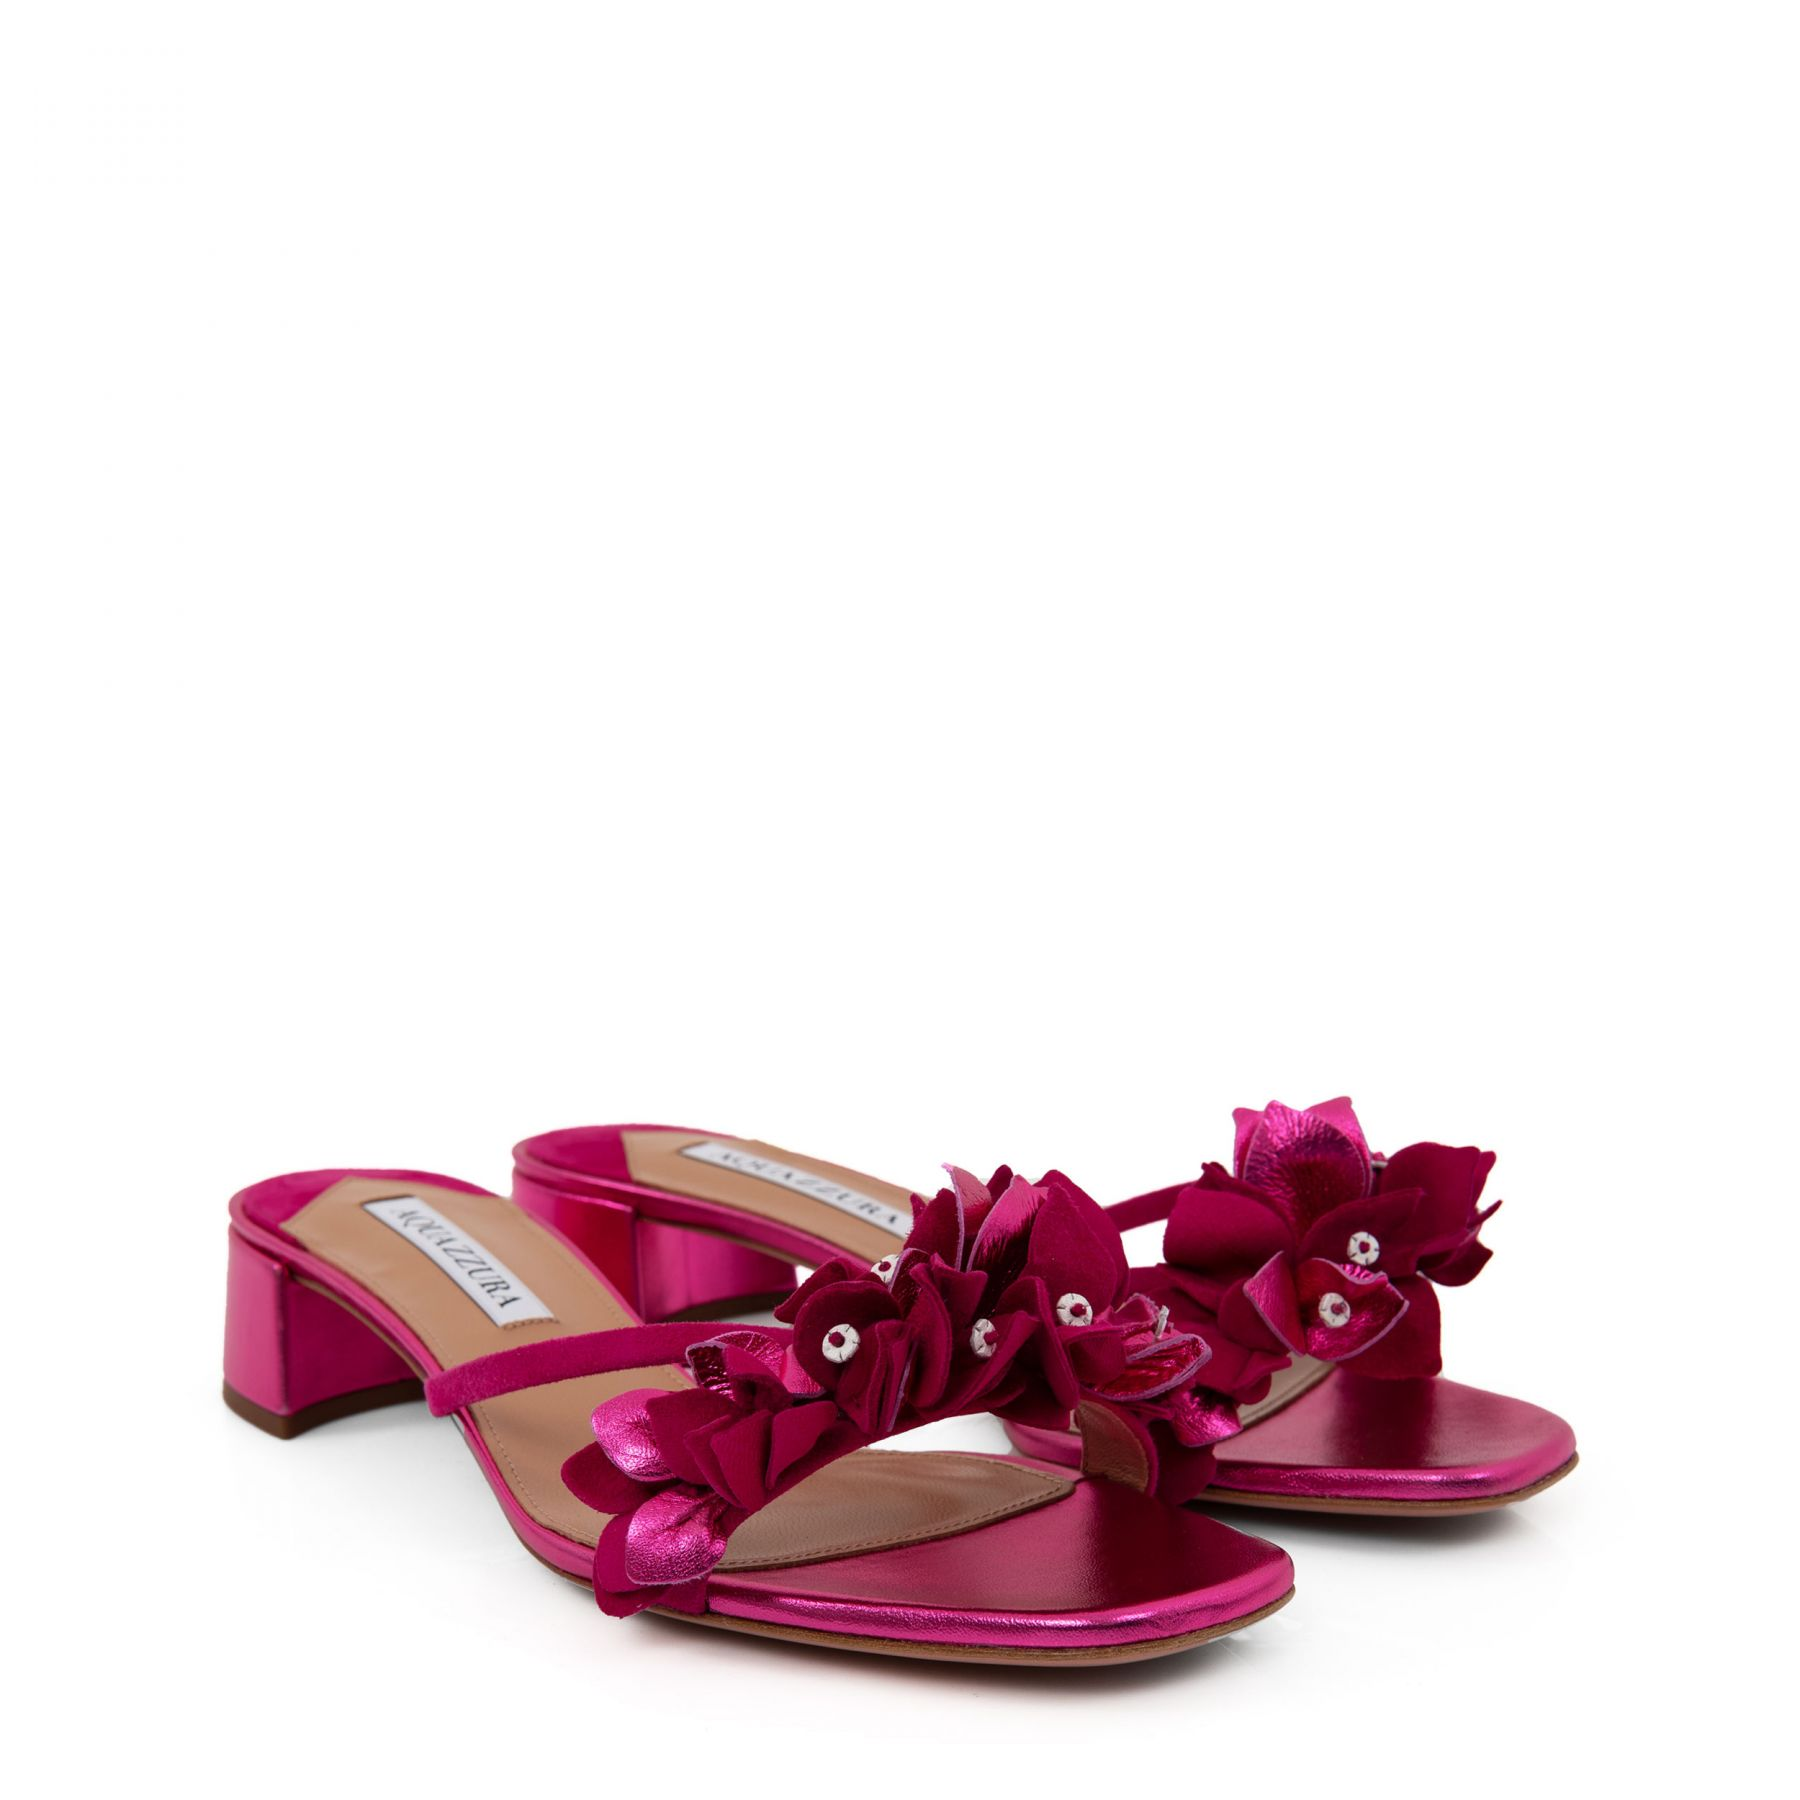 Мюли AQUAZZURA Bougainvillea розовые